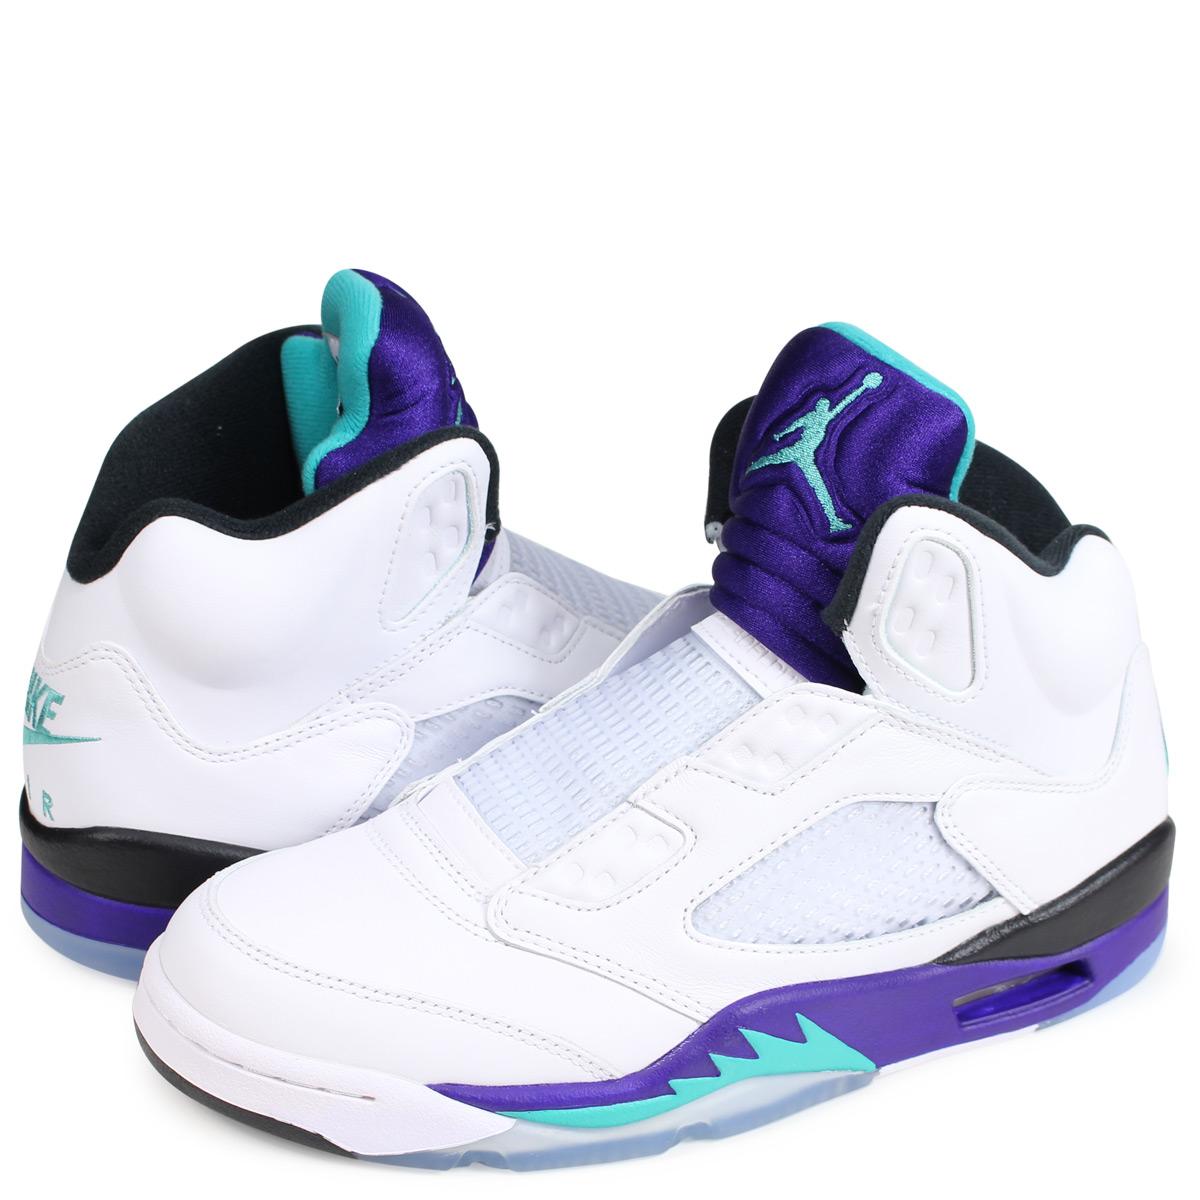 970ece263c0 Nike NIKE Air Jordan 5 nostalgic sneakers men AIR JORDAN 5 RETRO NRG FRESH  PRINCE grape AV3919-135